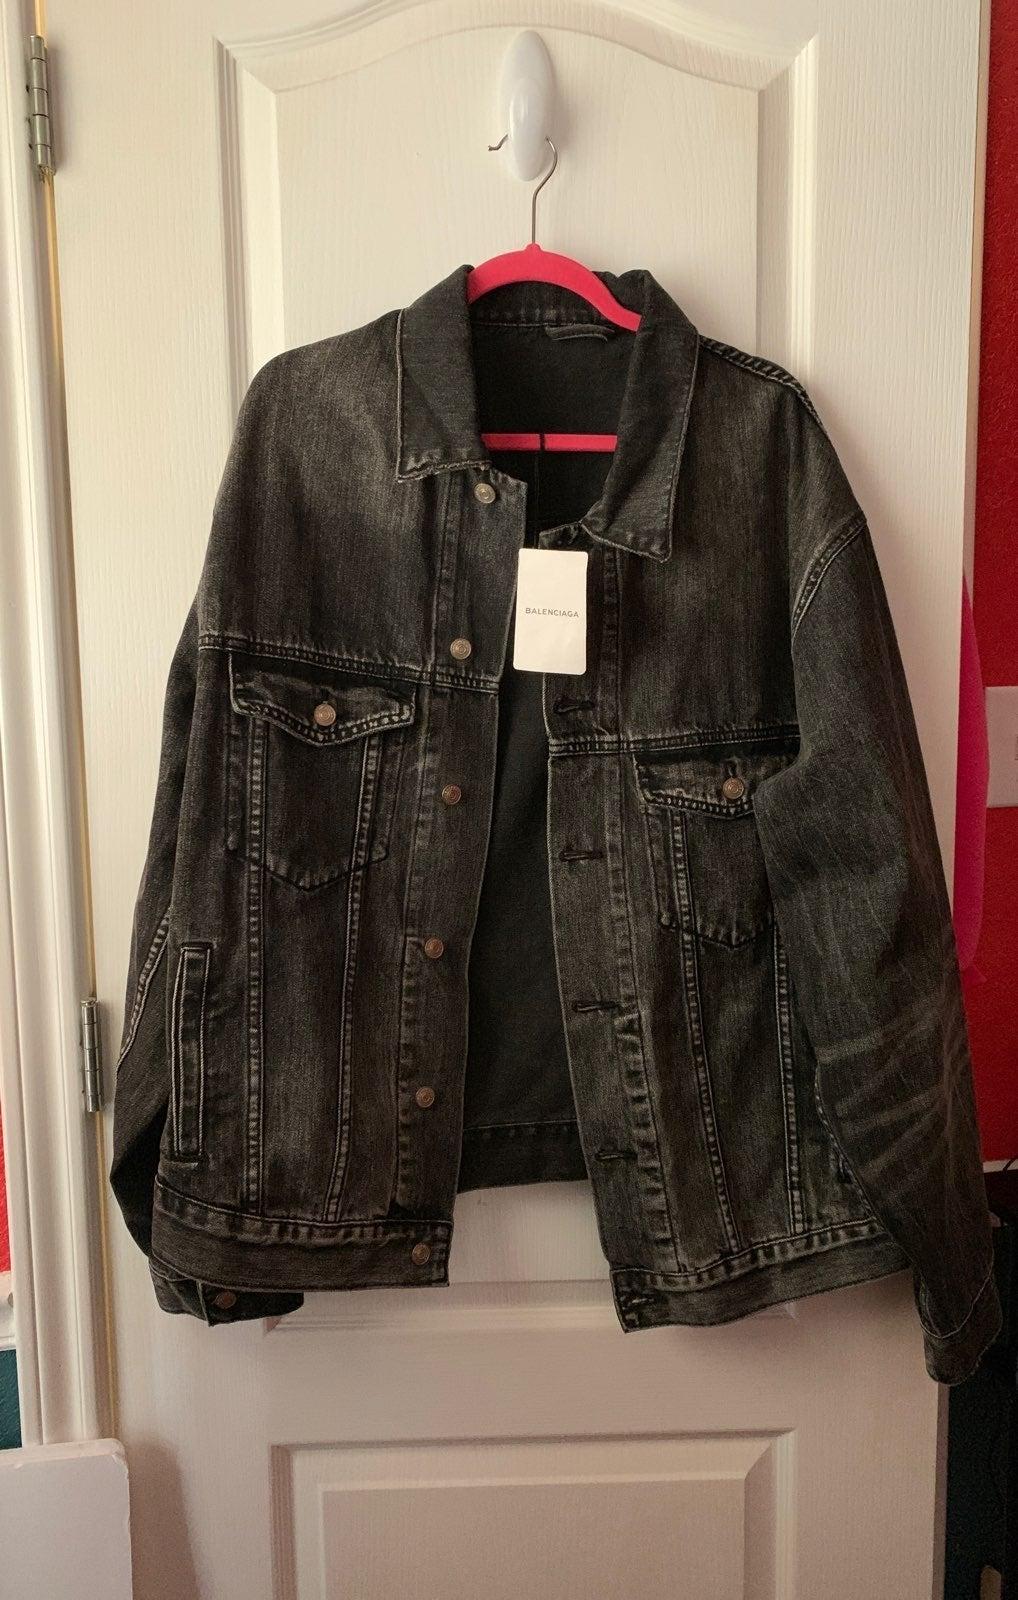 Balenciaga Black Denim Jacket